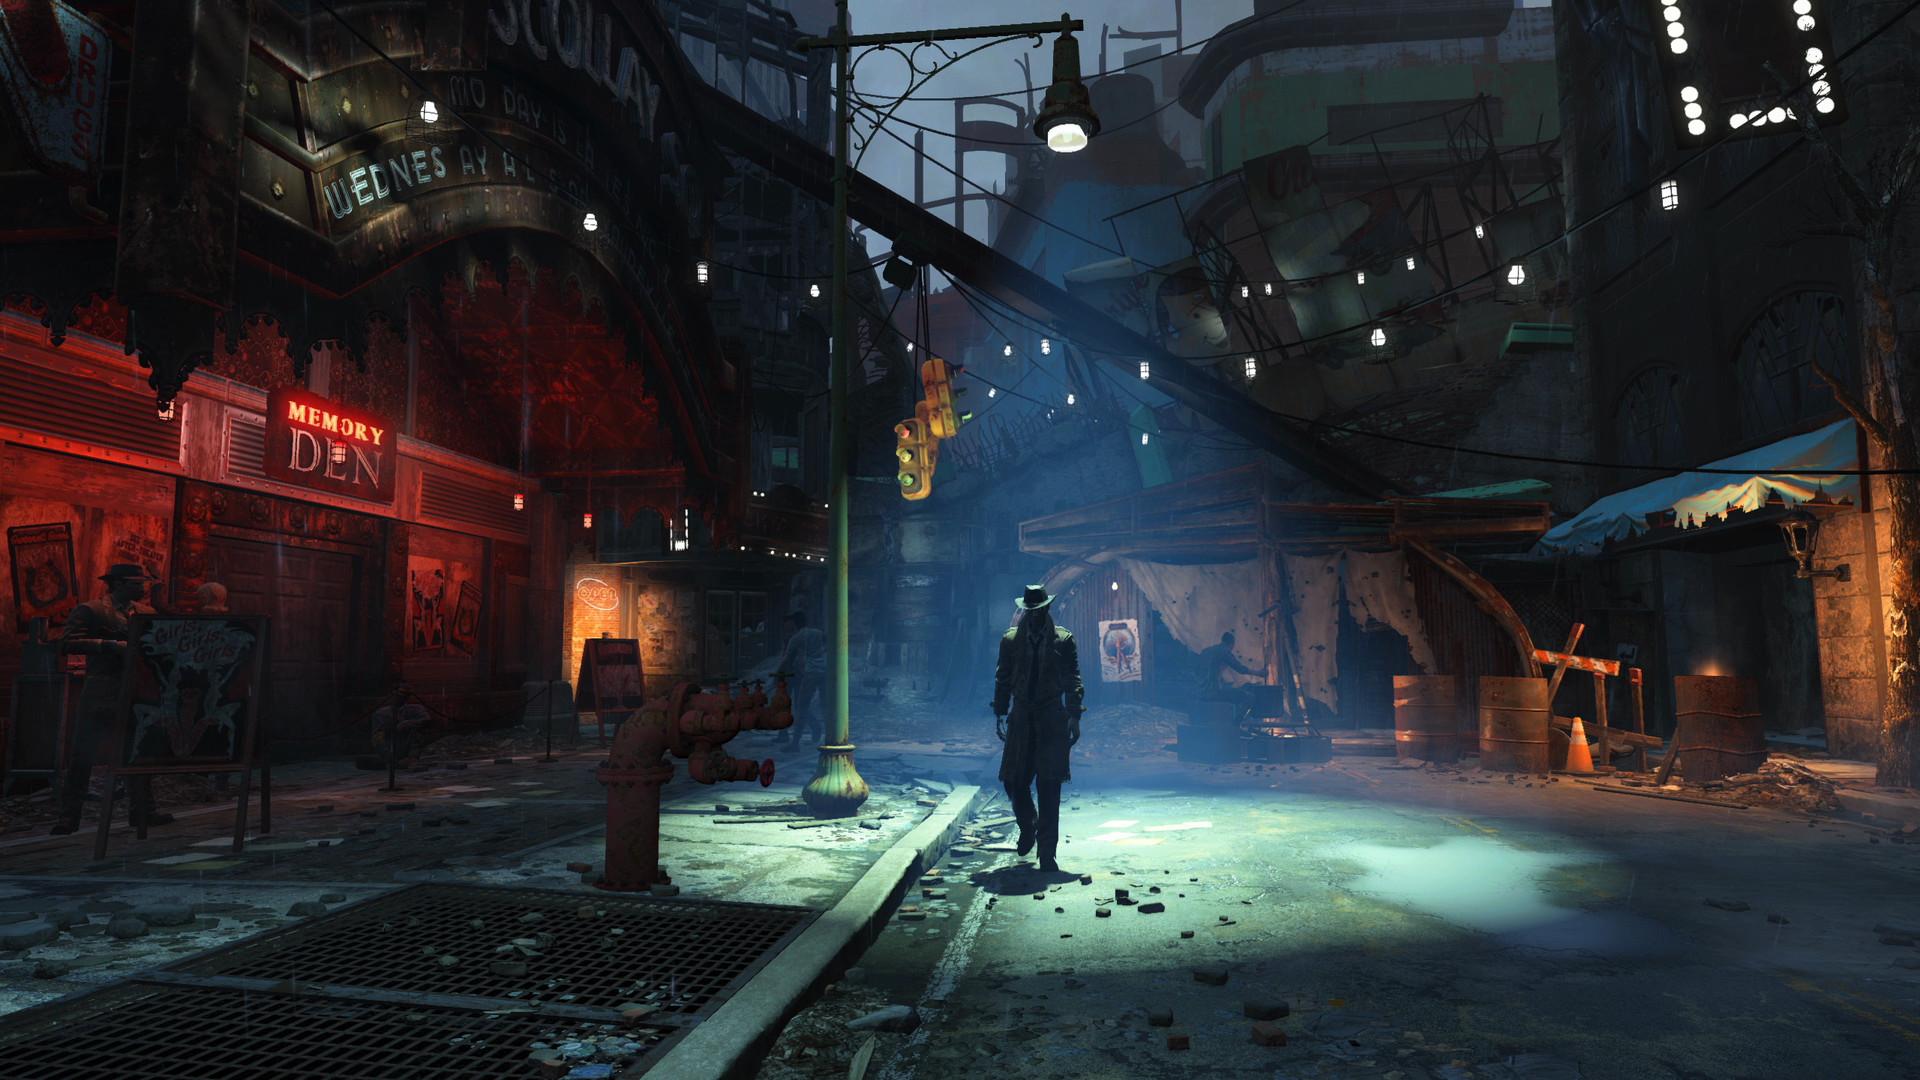 Res: 1920x1080, Fallout 4 Wallpaper Photo